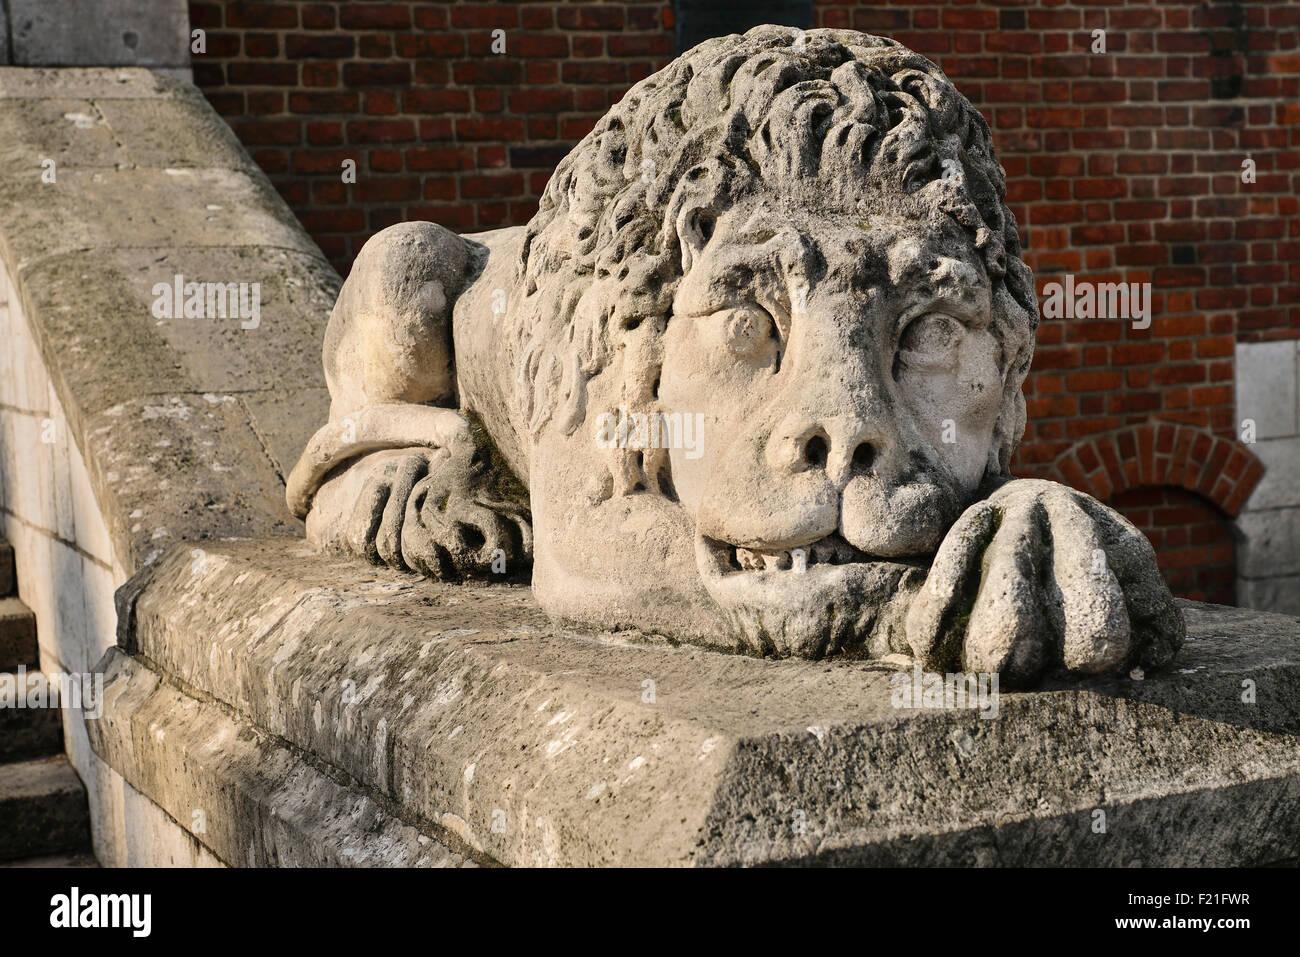 Poland, Krakow, Rynek Glowny or Main Market Square, Wieza Ratuszowa or Town Hall Tower, Stone lion at entrance. - Stock Image